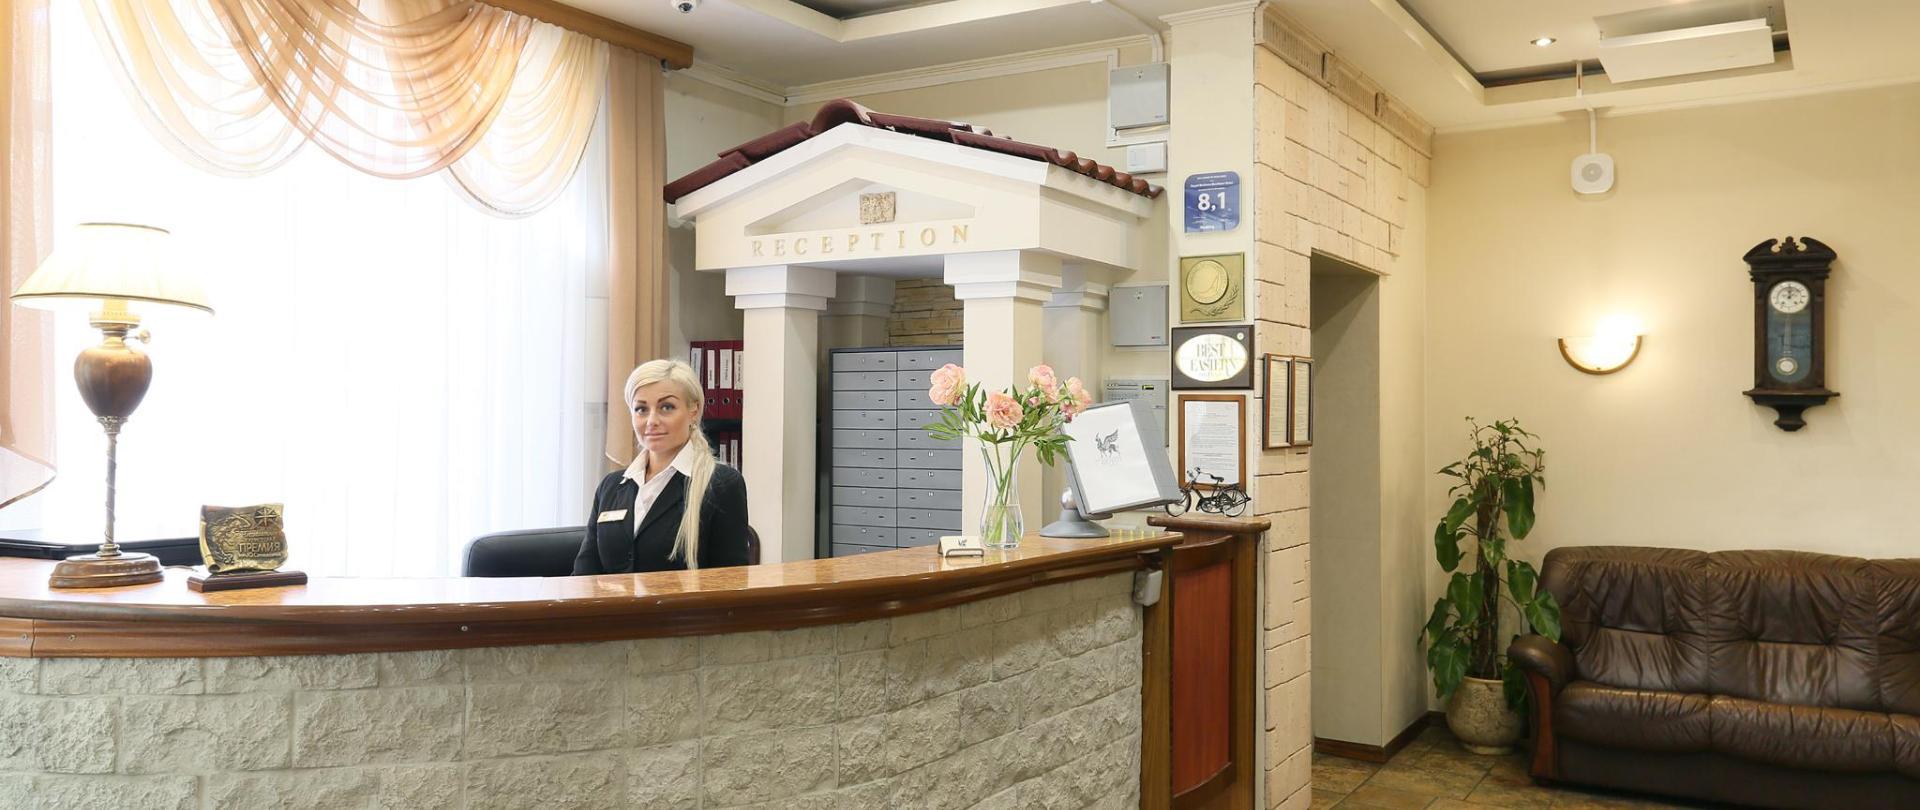 Reception отеля.JPG